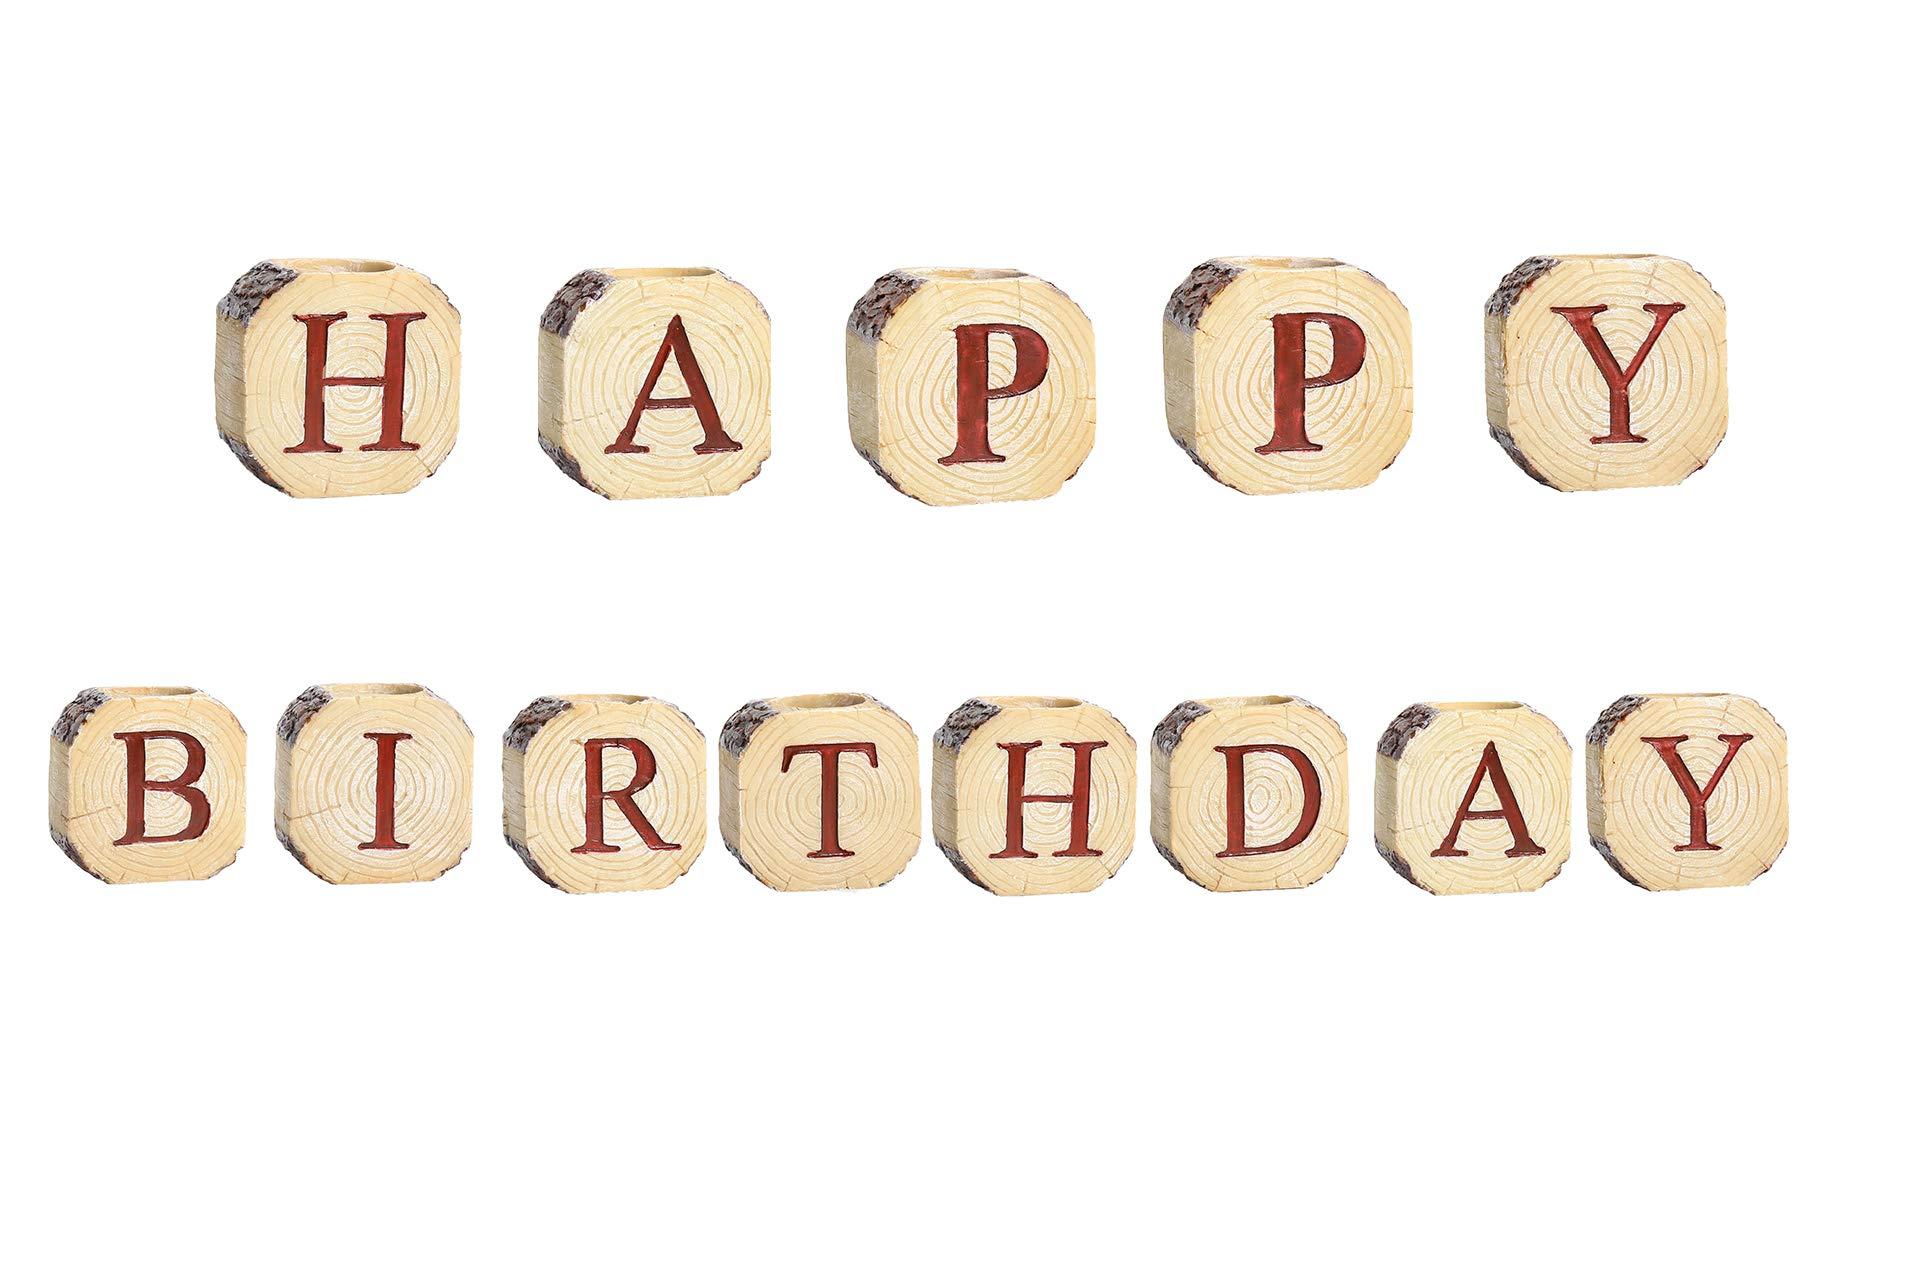 RICHEE-NL 26 Alphabet Resin Candleholder Imitation Wood Grain Creative Crafts Candlestick, Happy Birthday